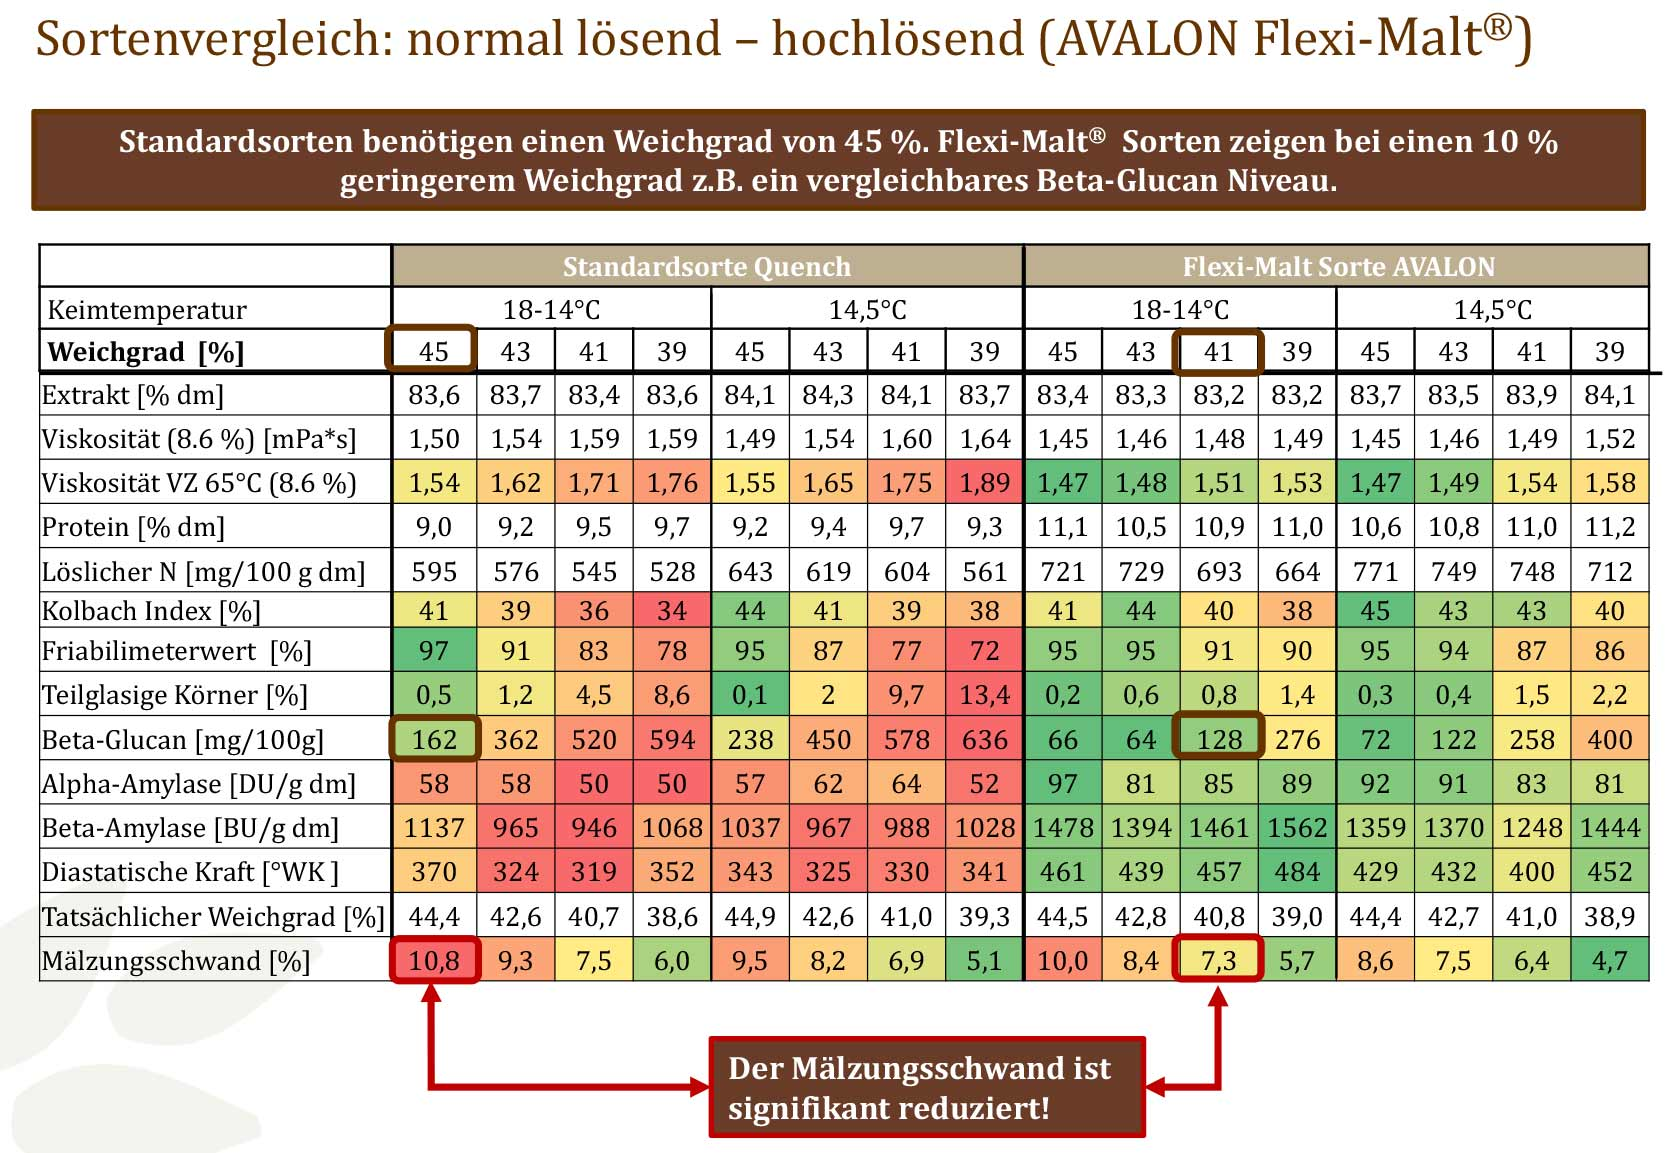 Flexi-Malt Tabelle